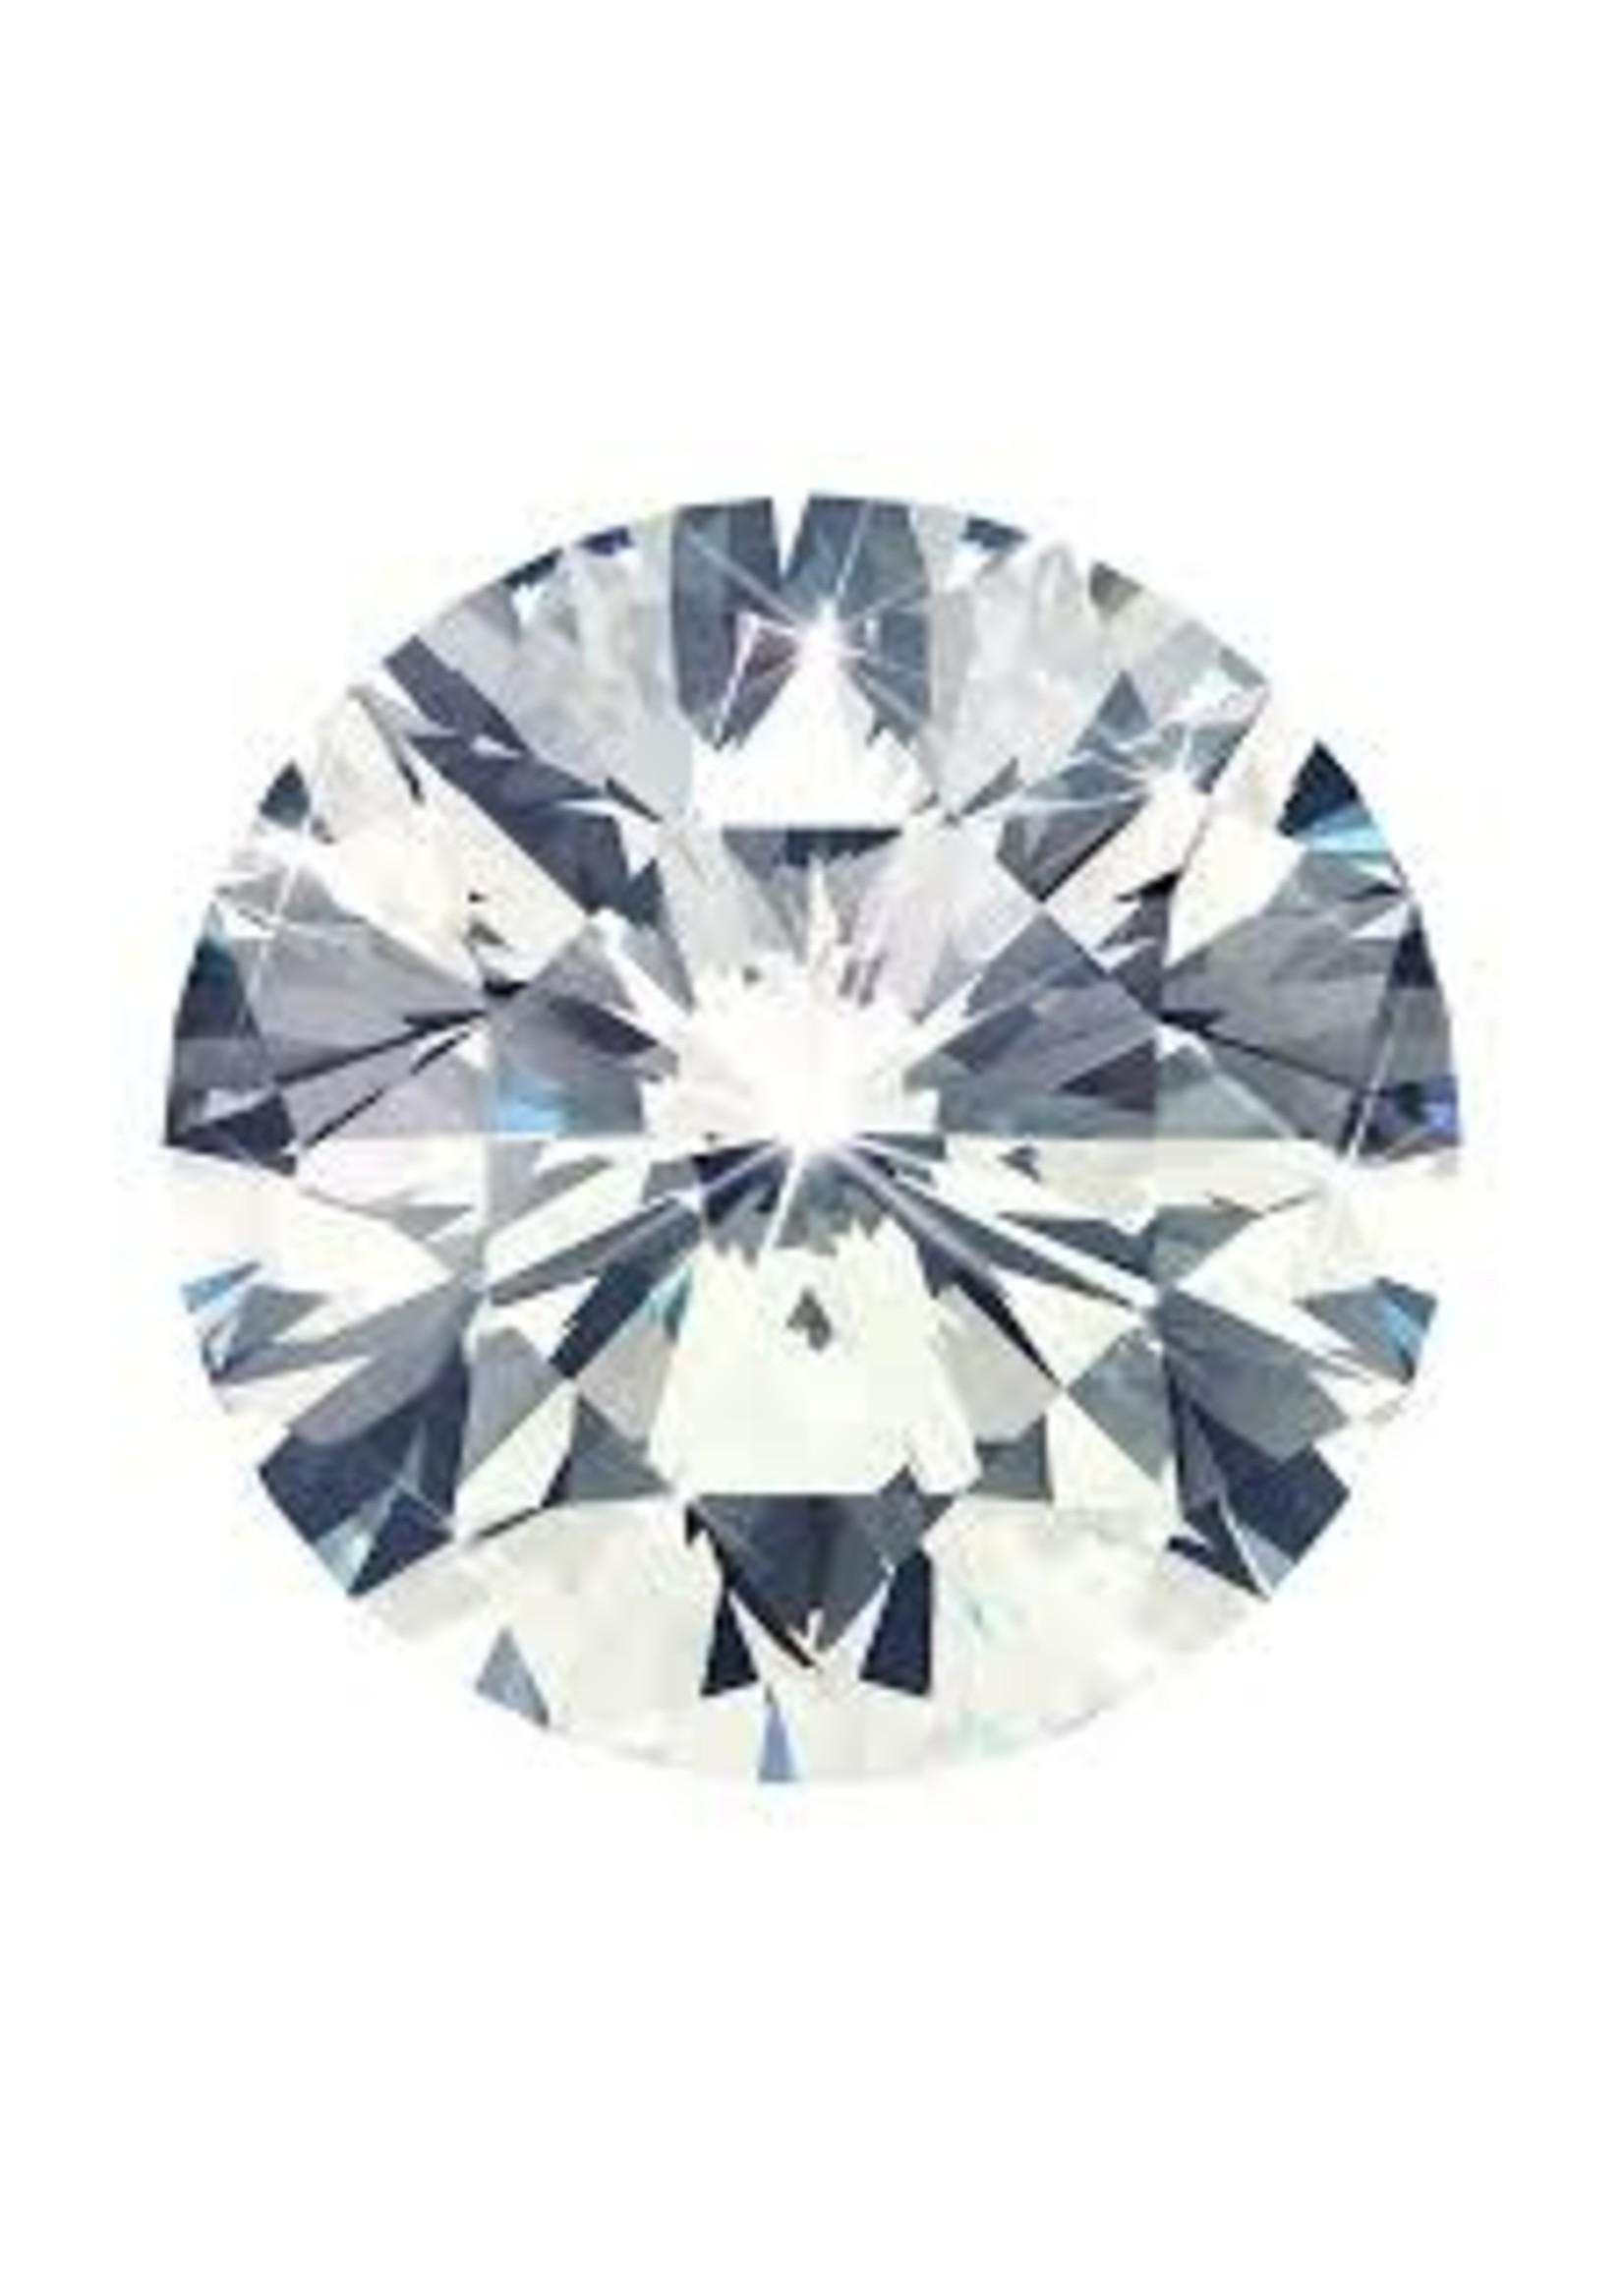 1.70CT ROUND BRILLIANT CUT DIAMOND (I-1/G/GOOD)